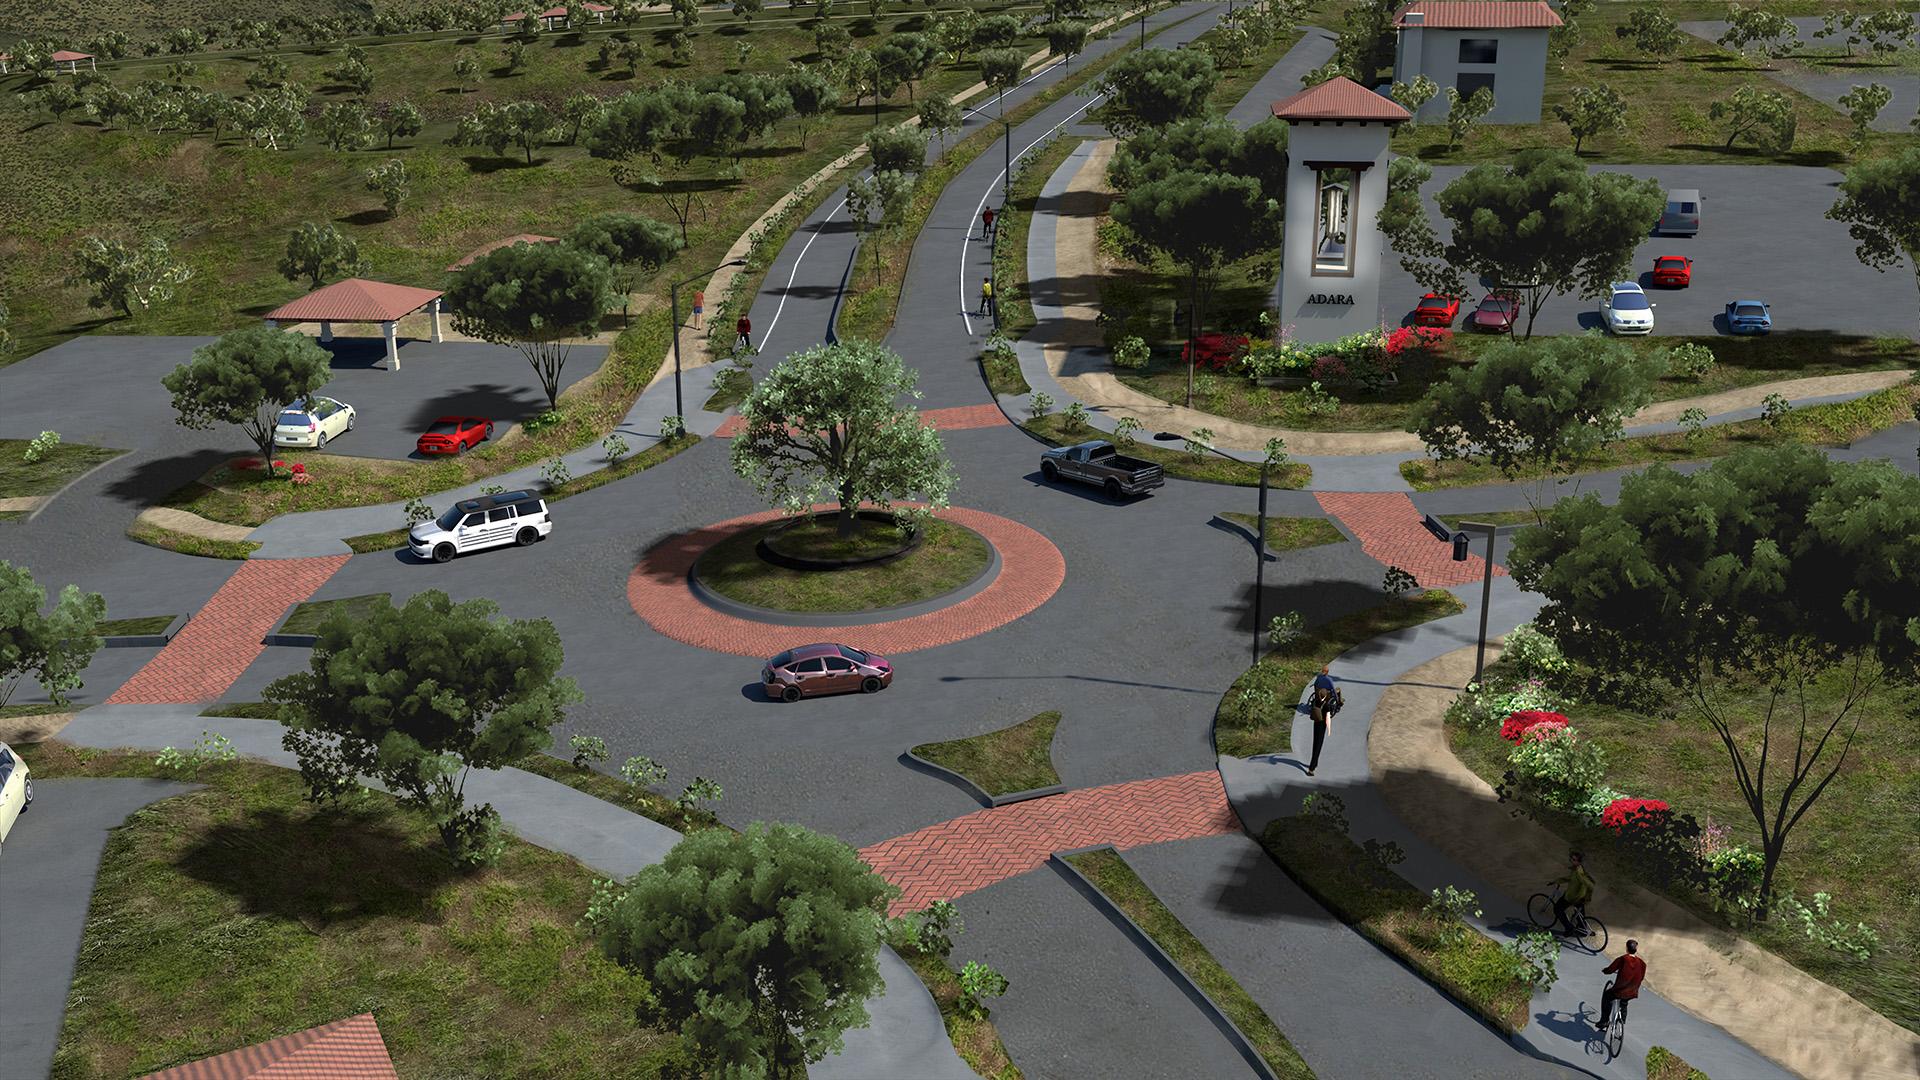 Adara Roundabout